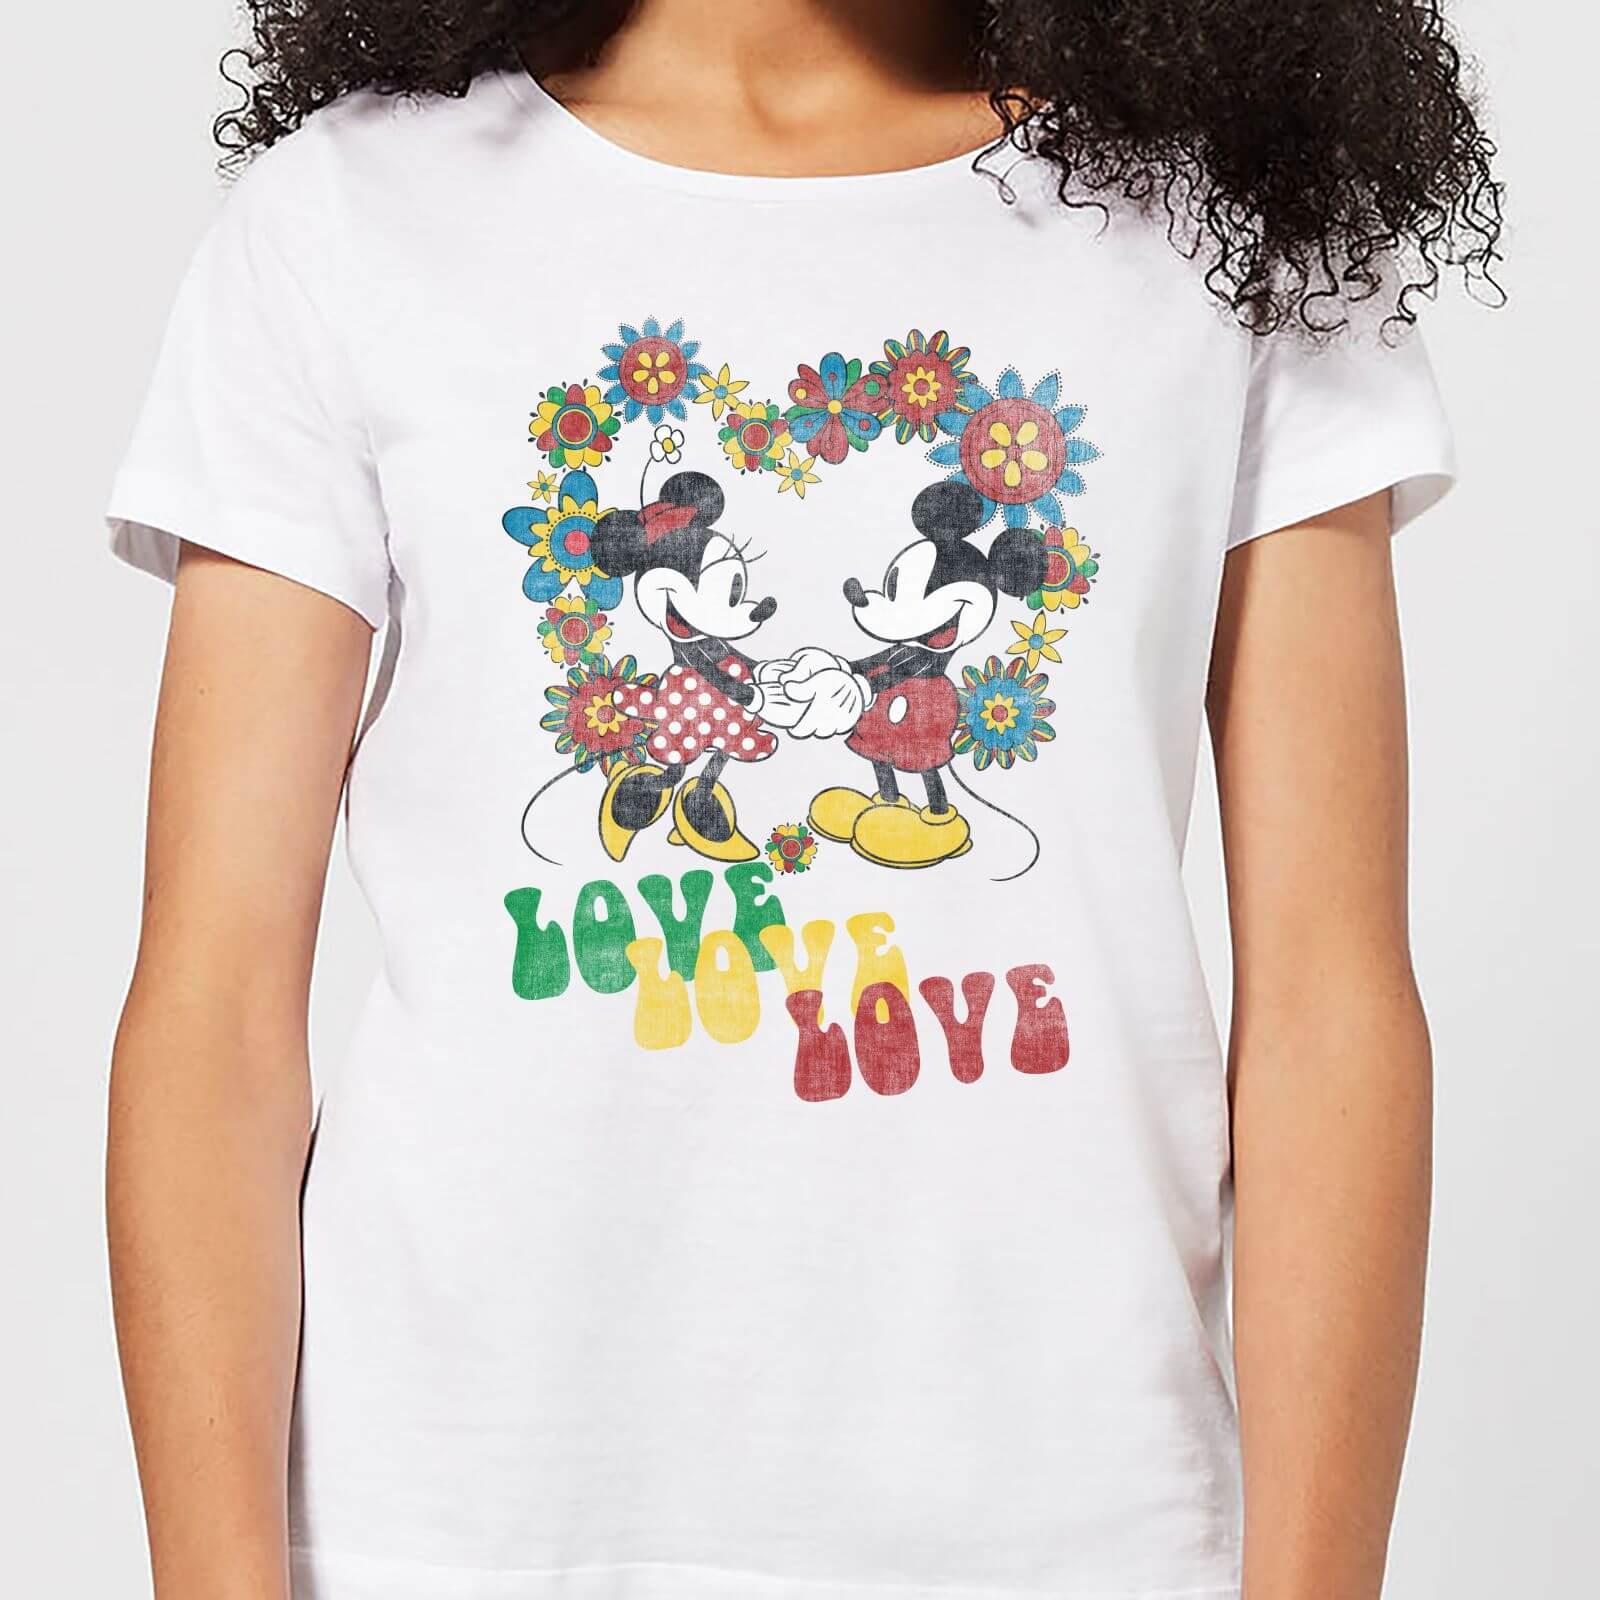 Disney Mickey Mouse Hippie Love Women's T-Shirt - White - 5XL - White